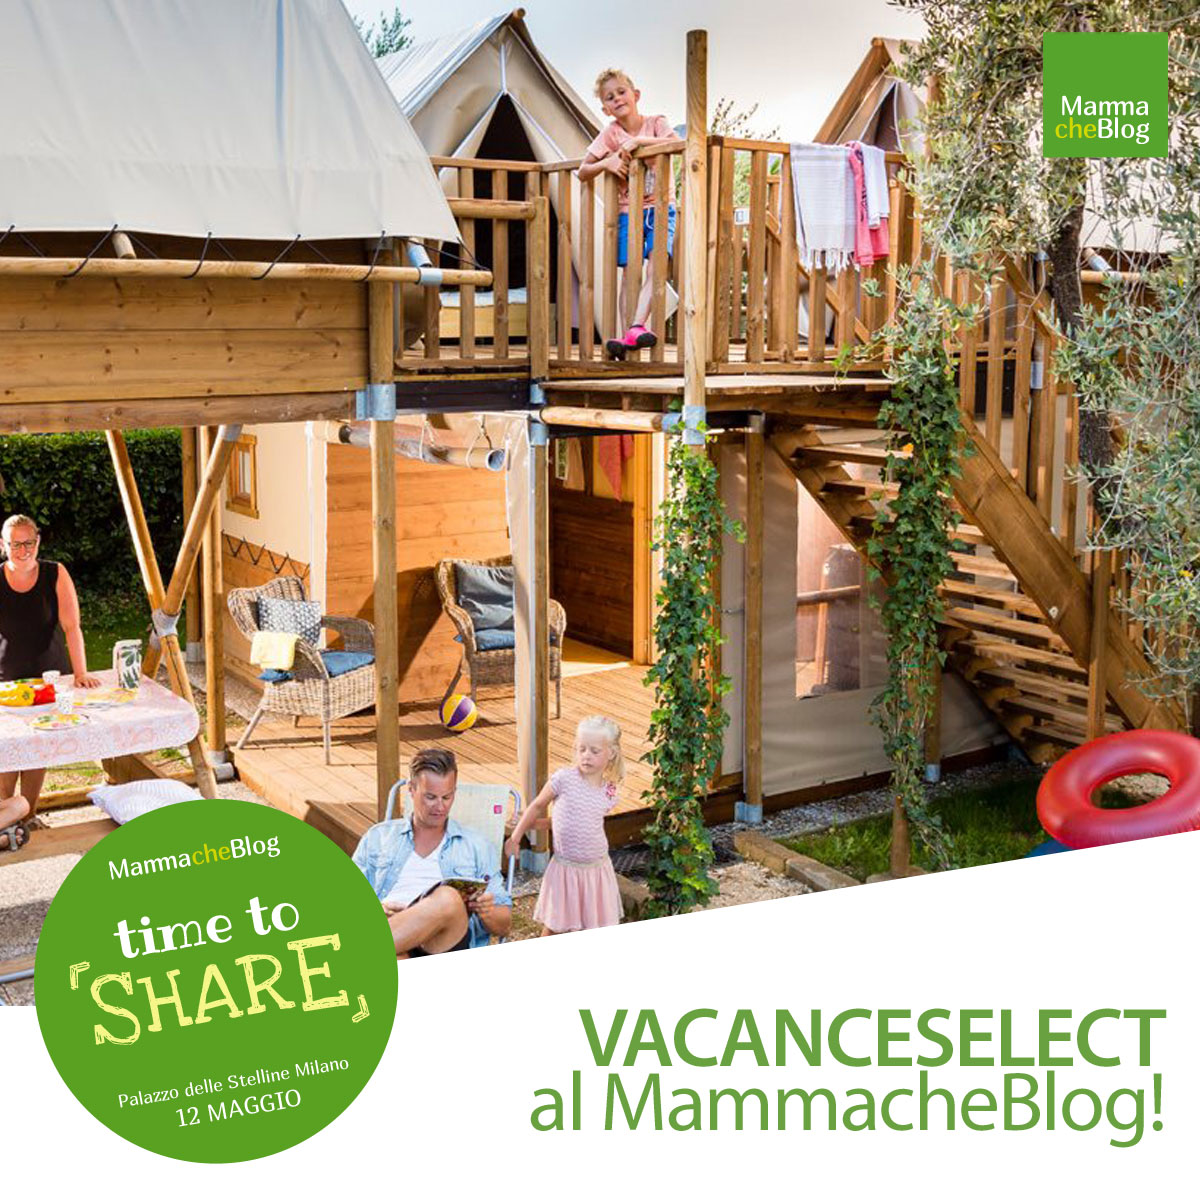 vacanceselect-mammacheblog